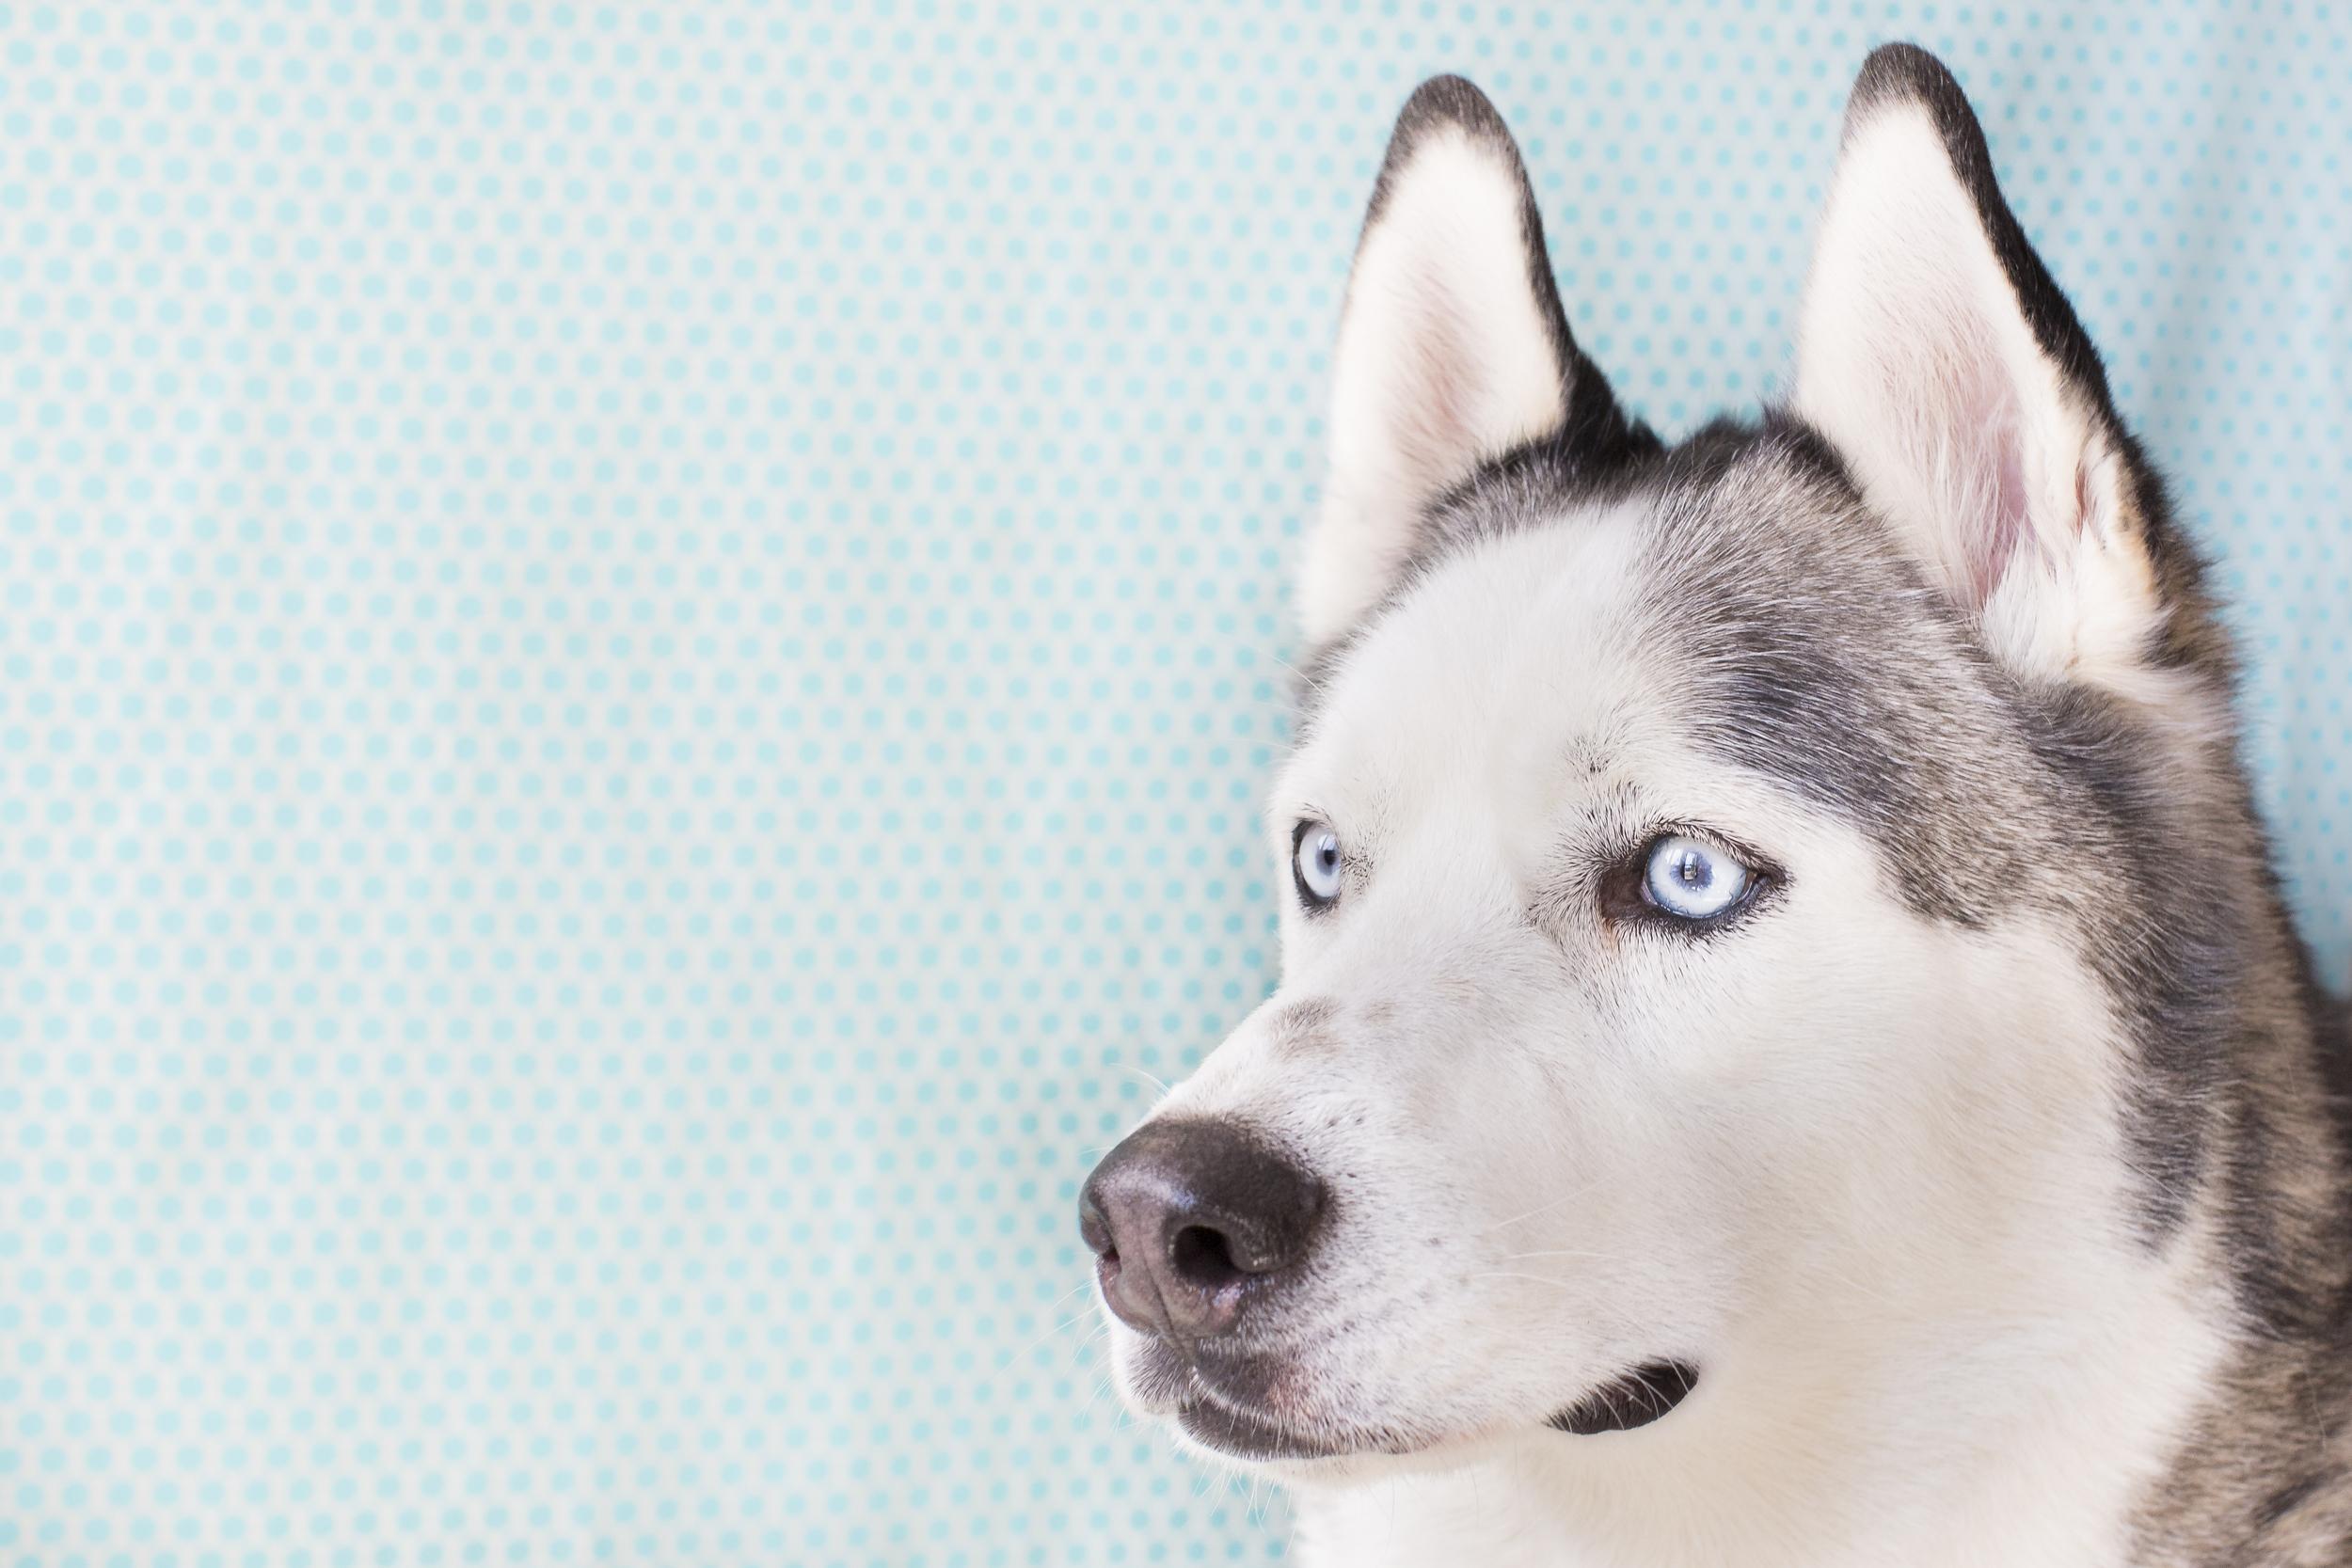 37 Huskey dog studio pet photography session on blue polka dot background blue eyes.jpg